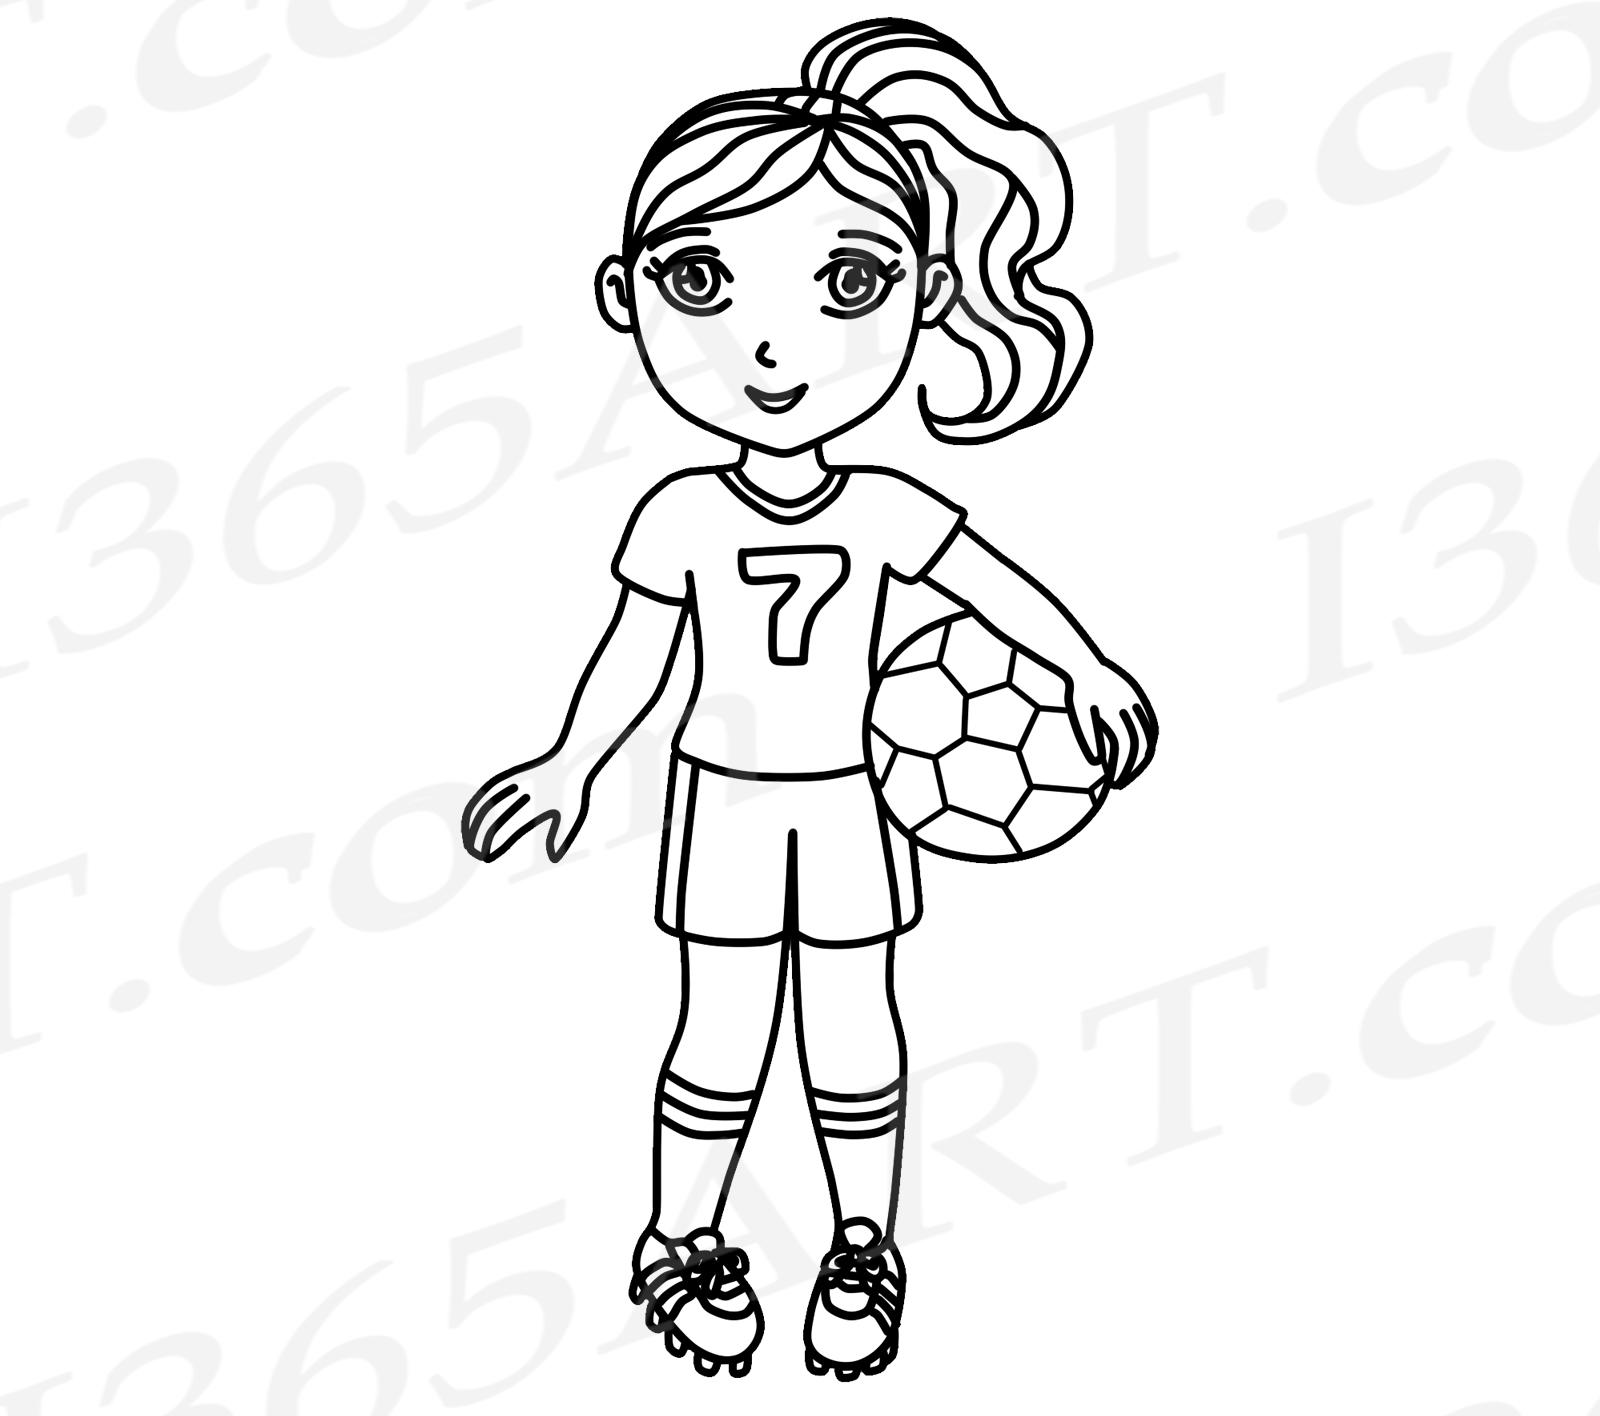 Clipart sports line art. Soccer pink girl clip